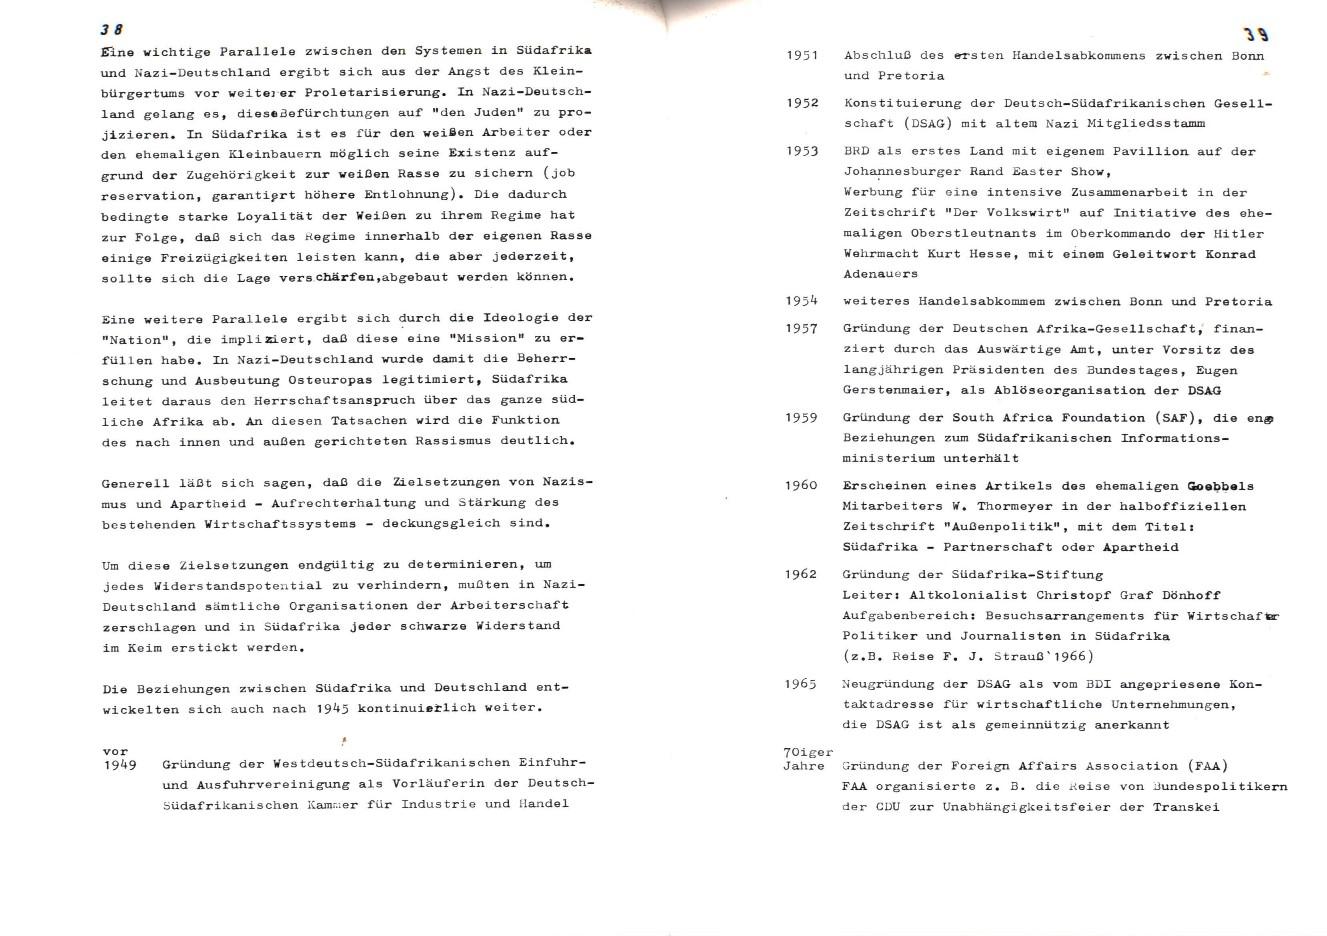 Muenster_AKAFRIK_1981_Suedafrika_BRD_21